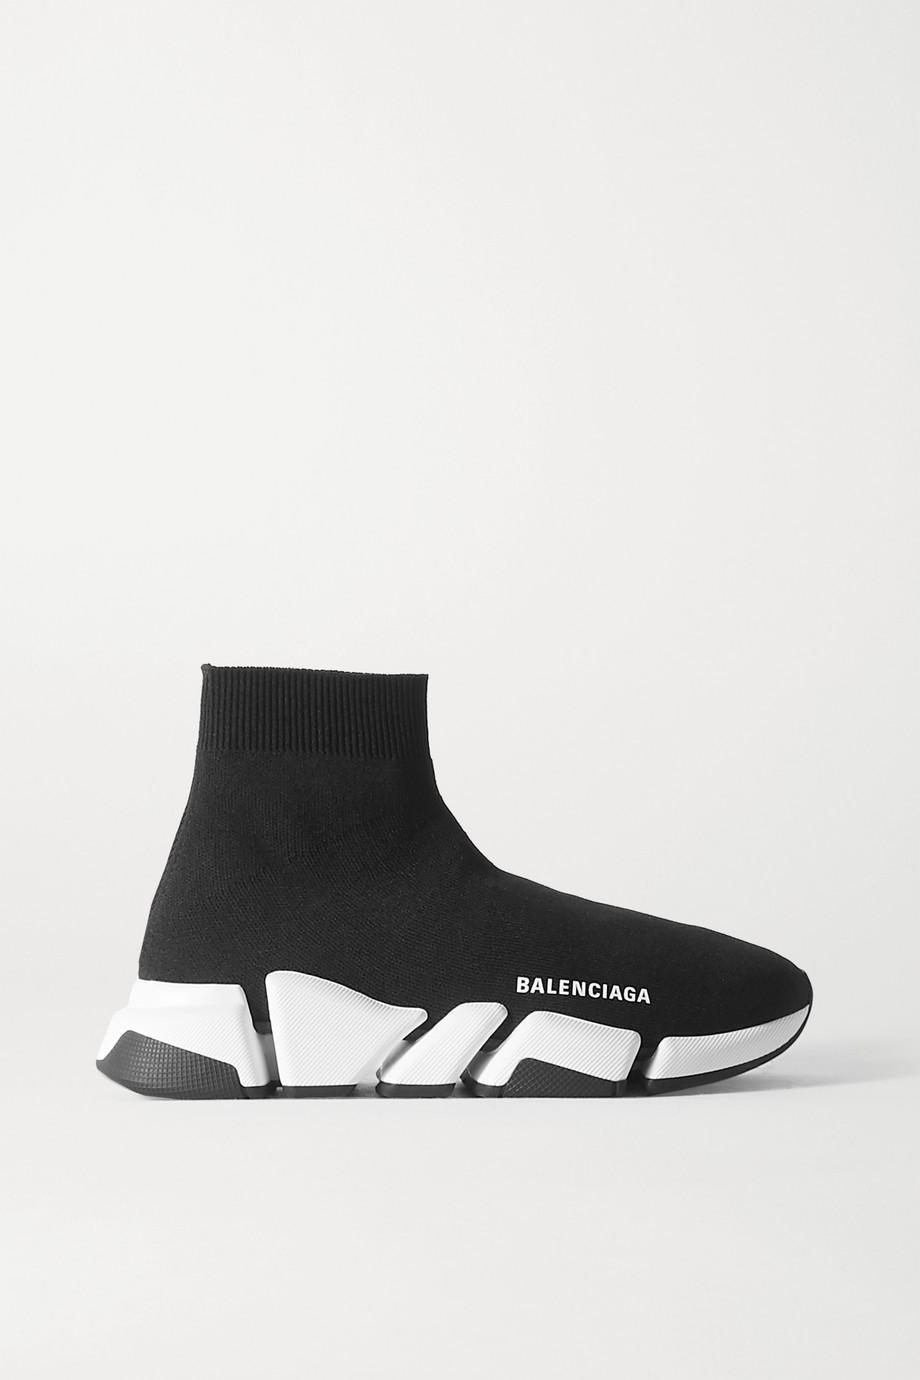 Balenciaga Speed 2.0 logo-print stretch-knit high-top sneakers